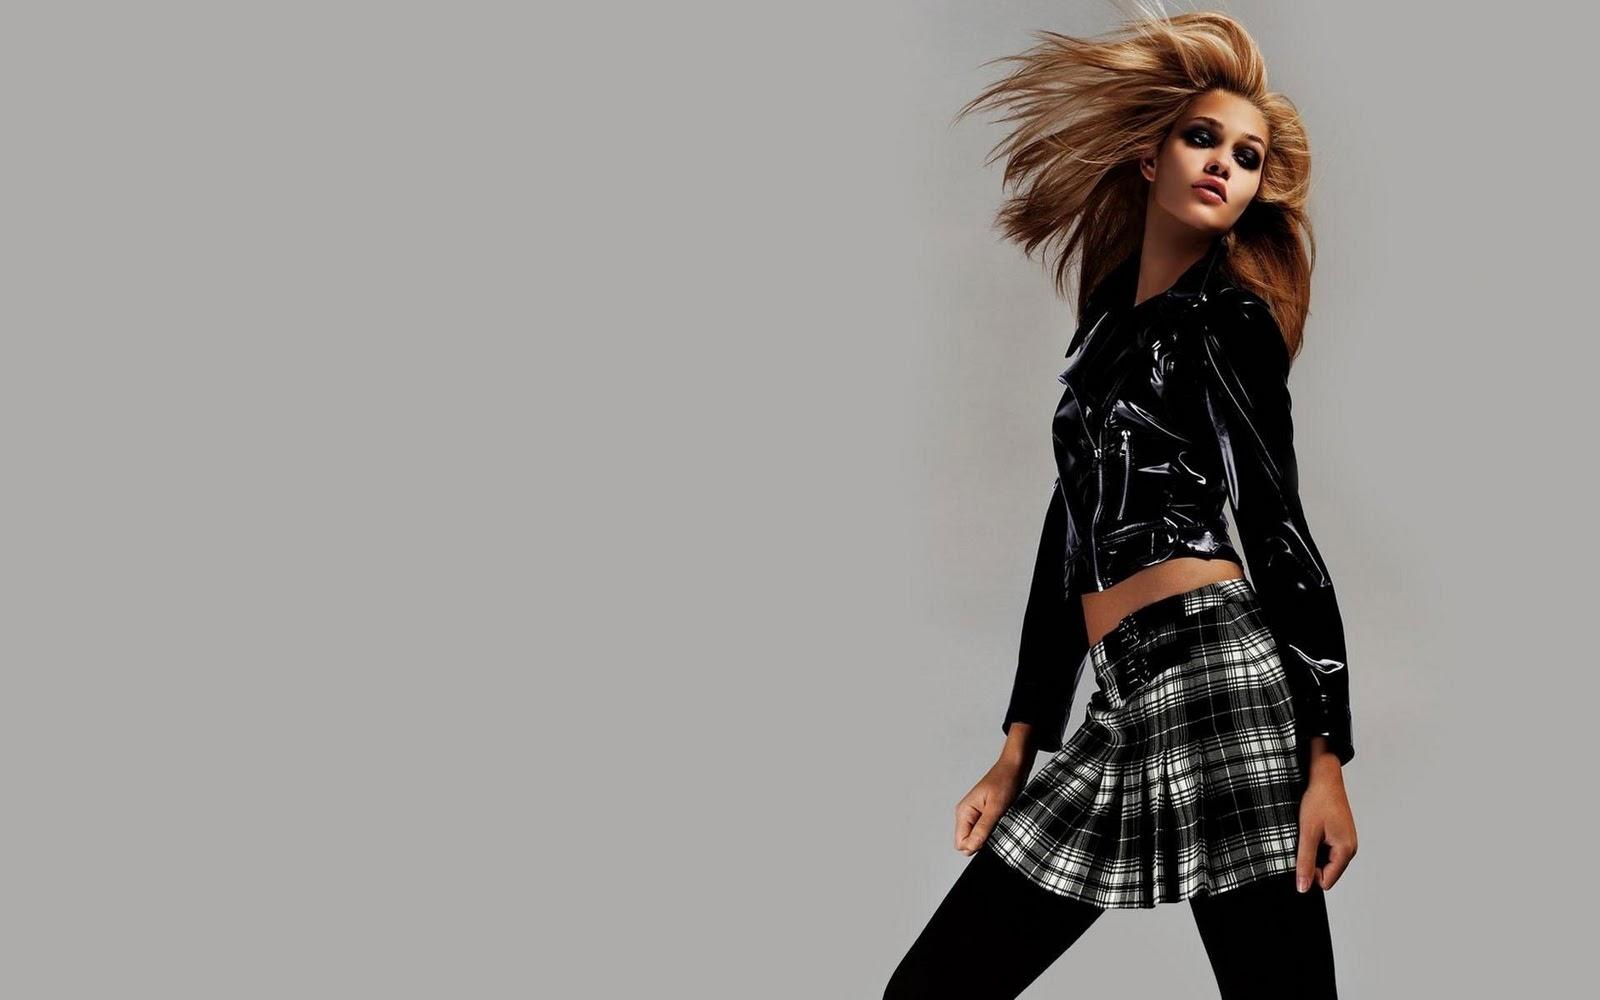 Fashion Girl Model Wallpaper 59926